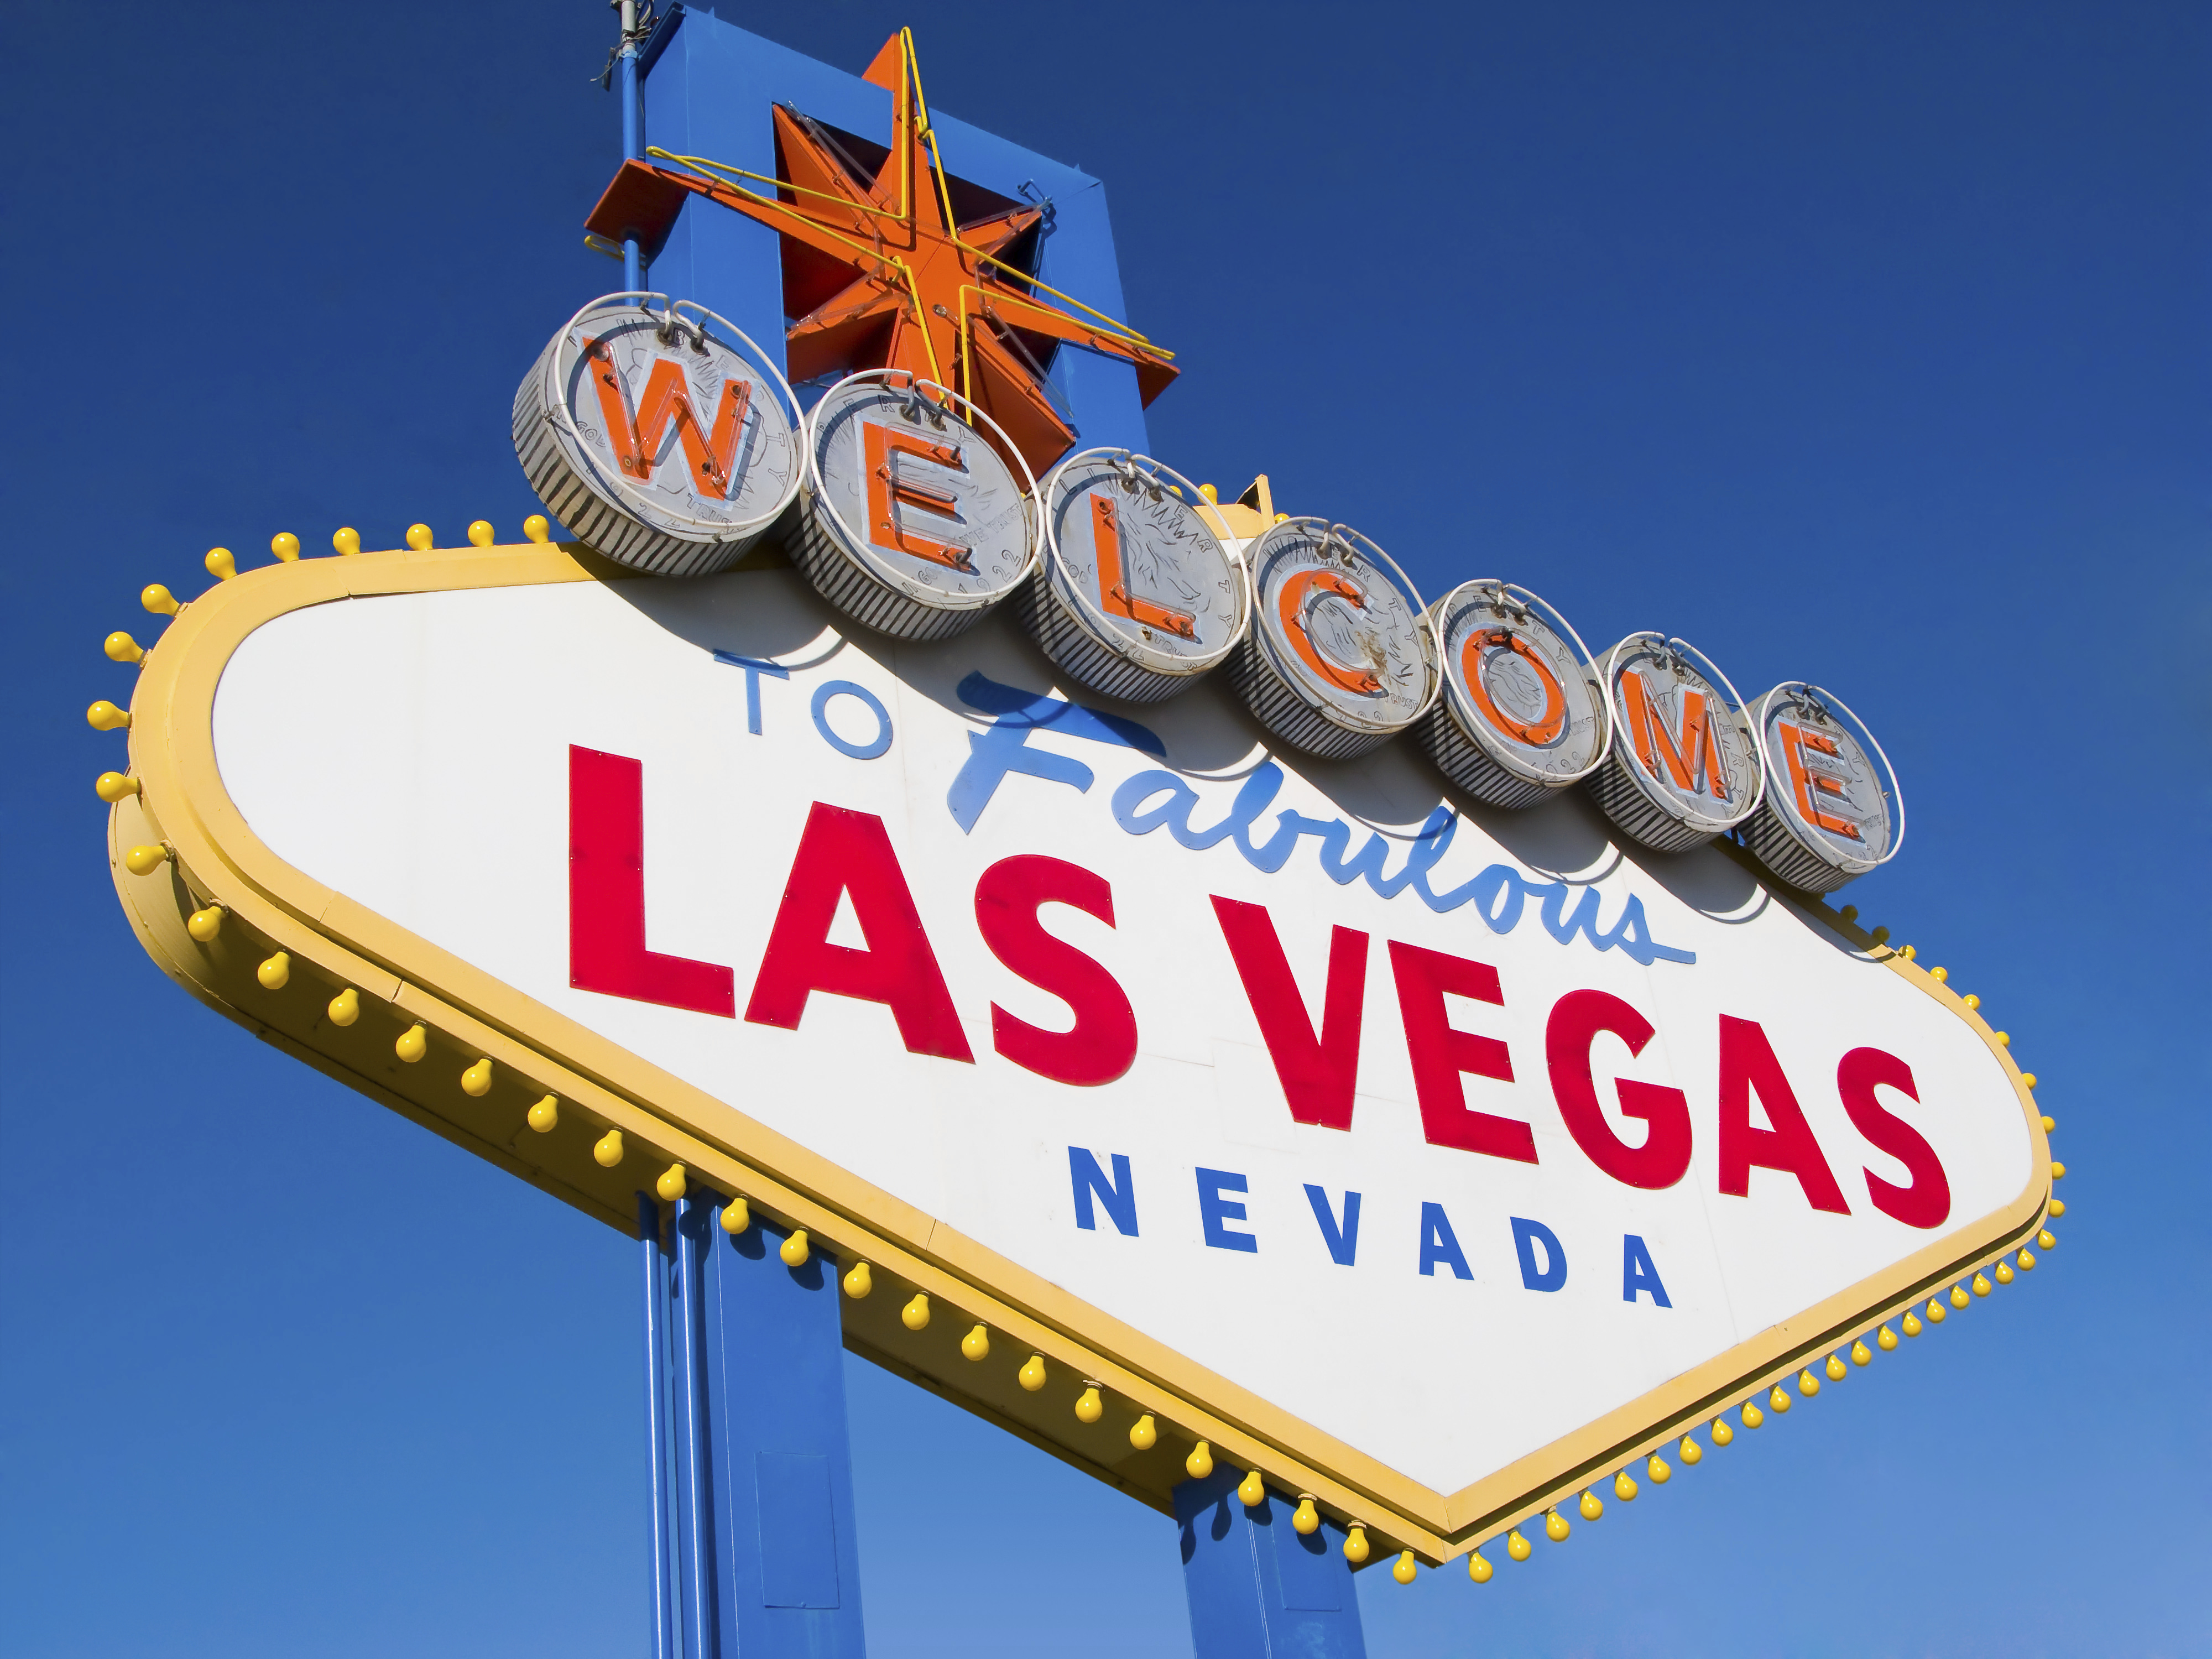 Las vegas is a gambling mecca in Nevada